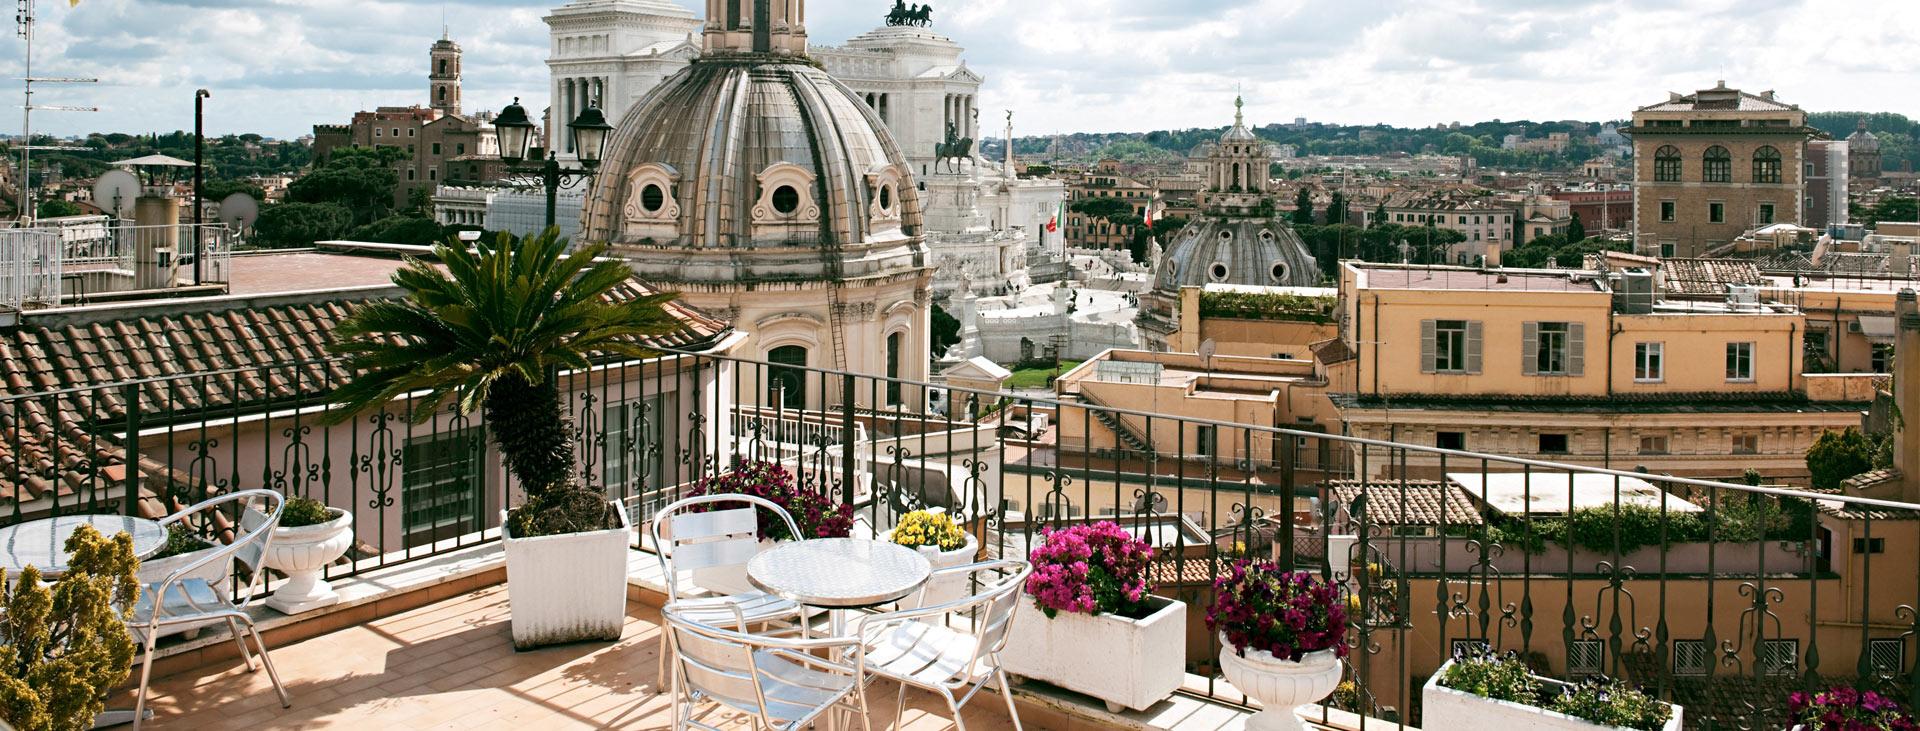 Pace Helvezia, Rooma, Italia